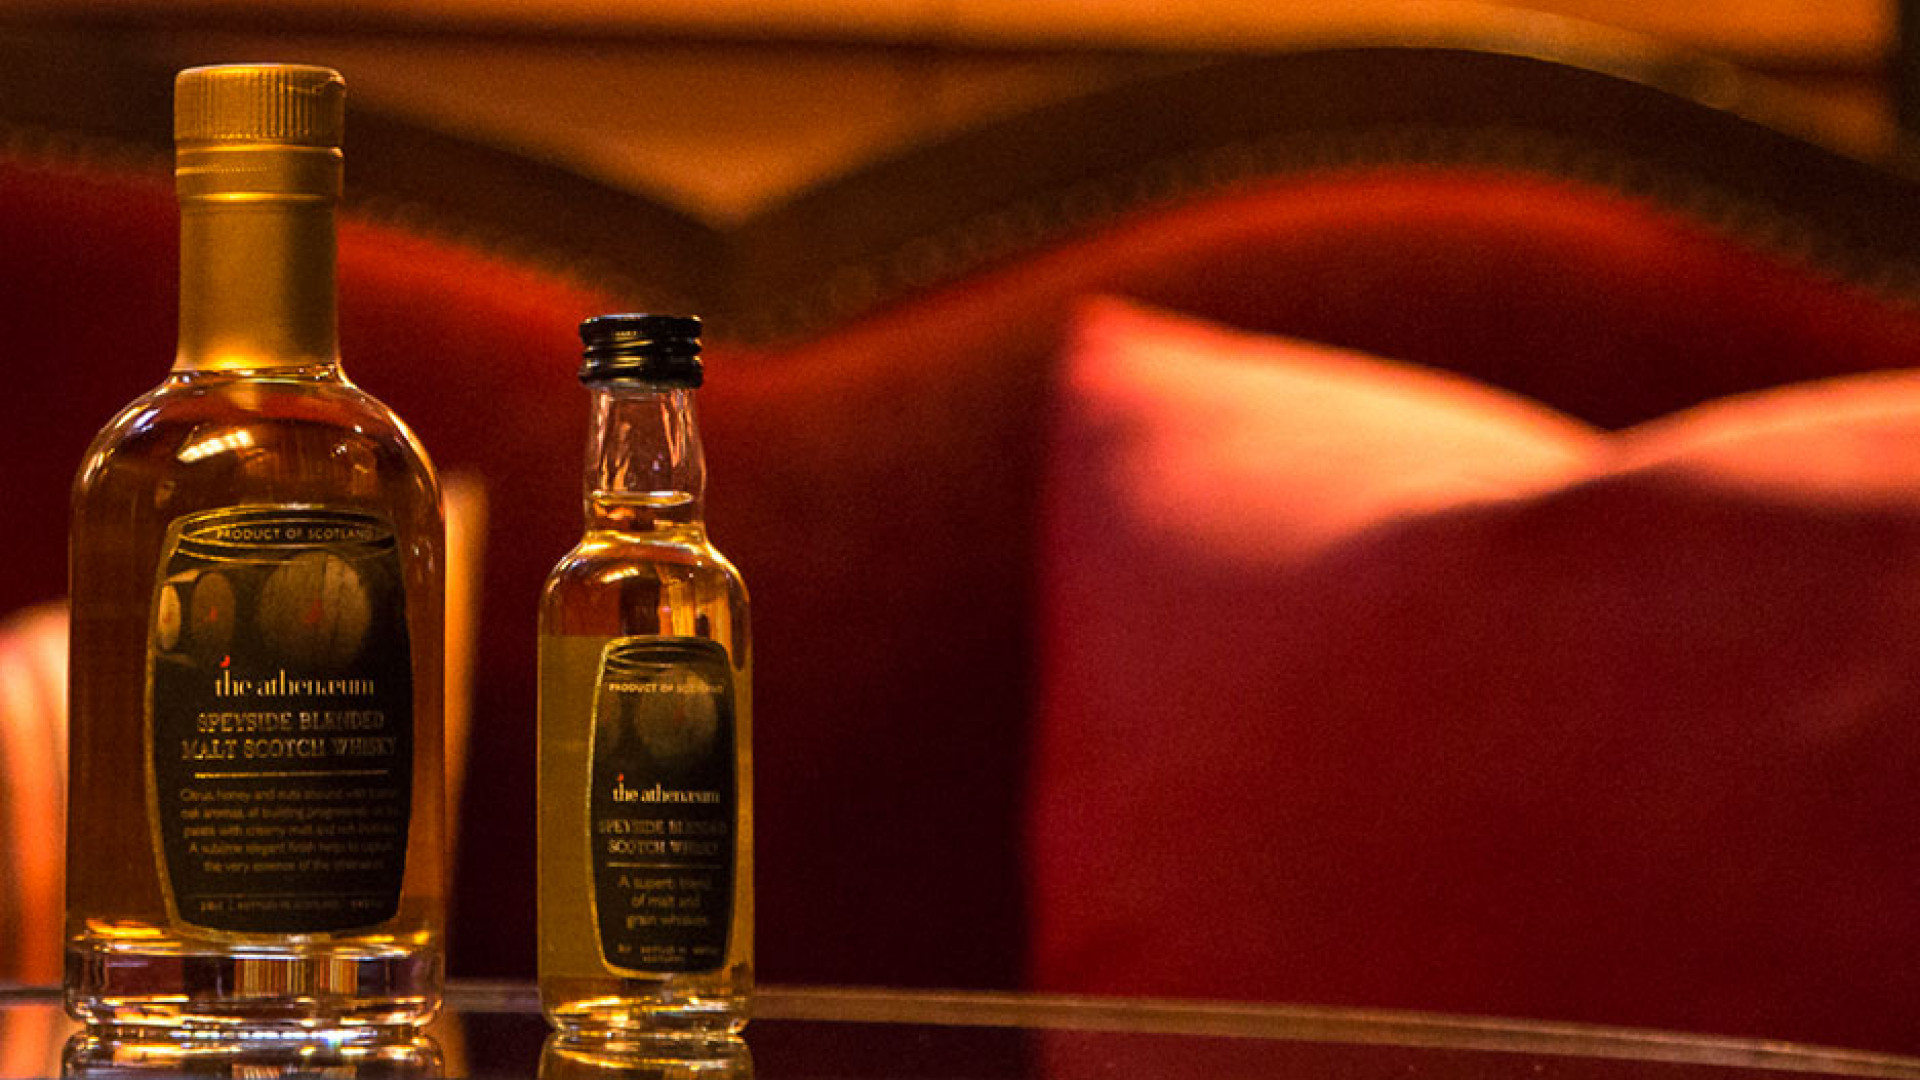 The Whisky Bar at Athenaeum